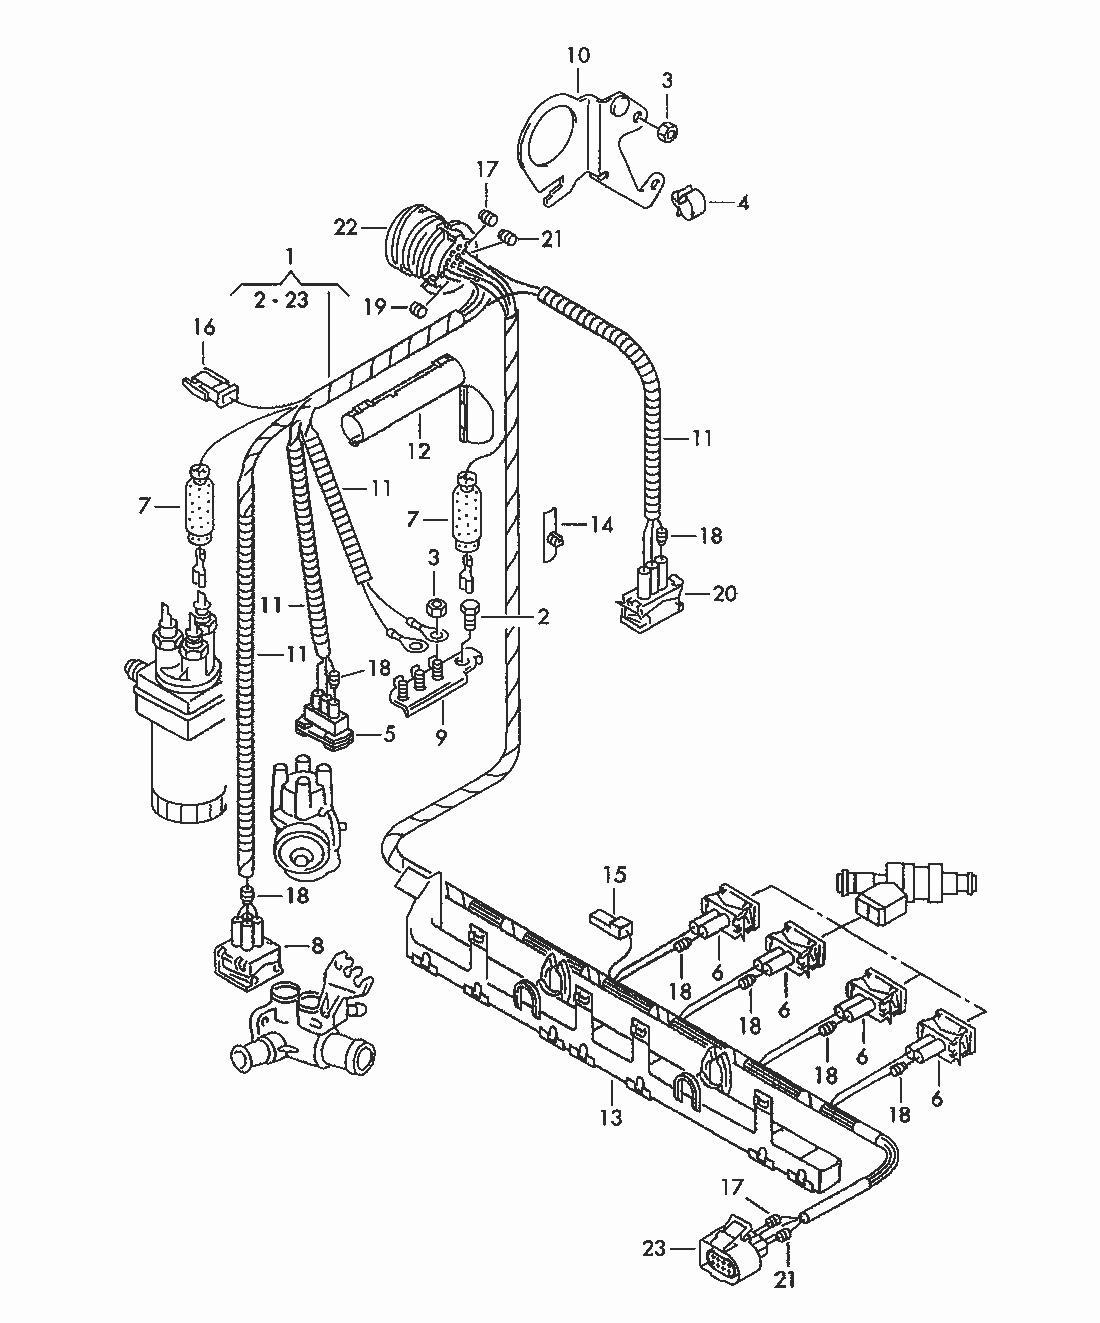 mk3 vr6 engine harness diagram